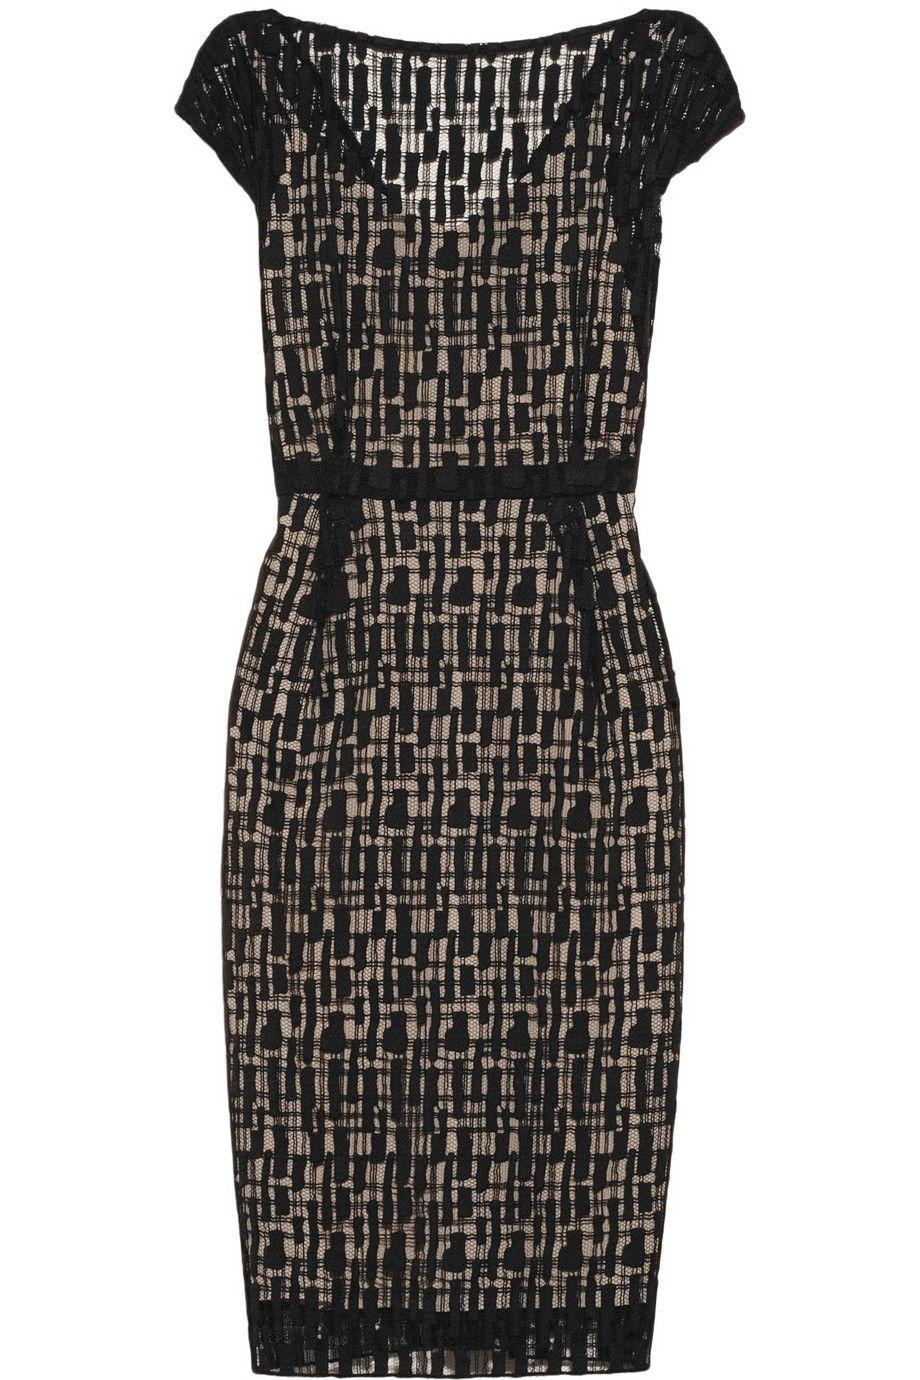 Lela Rose|Lace dress|NET-A-PORTER.COM